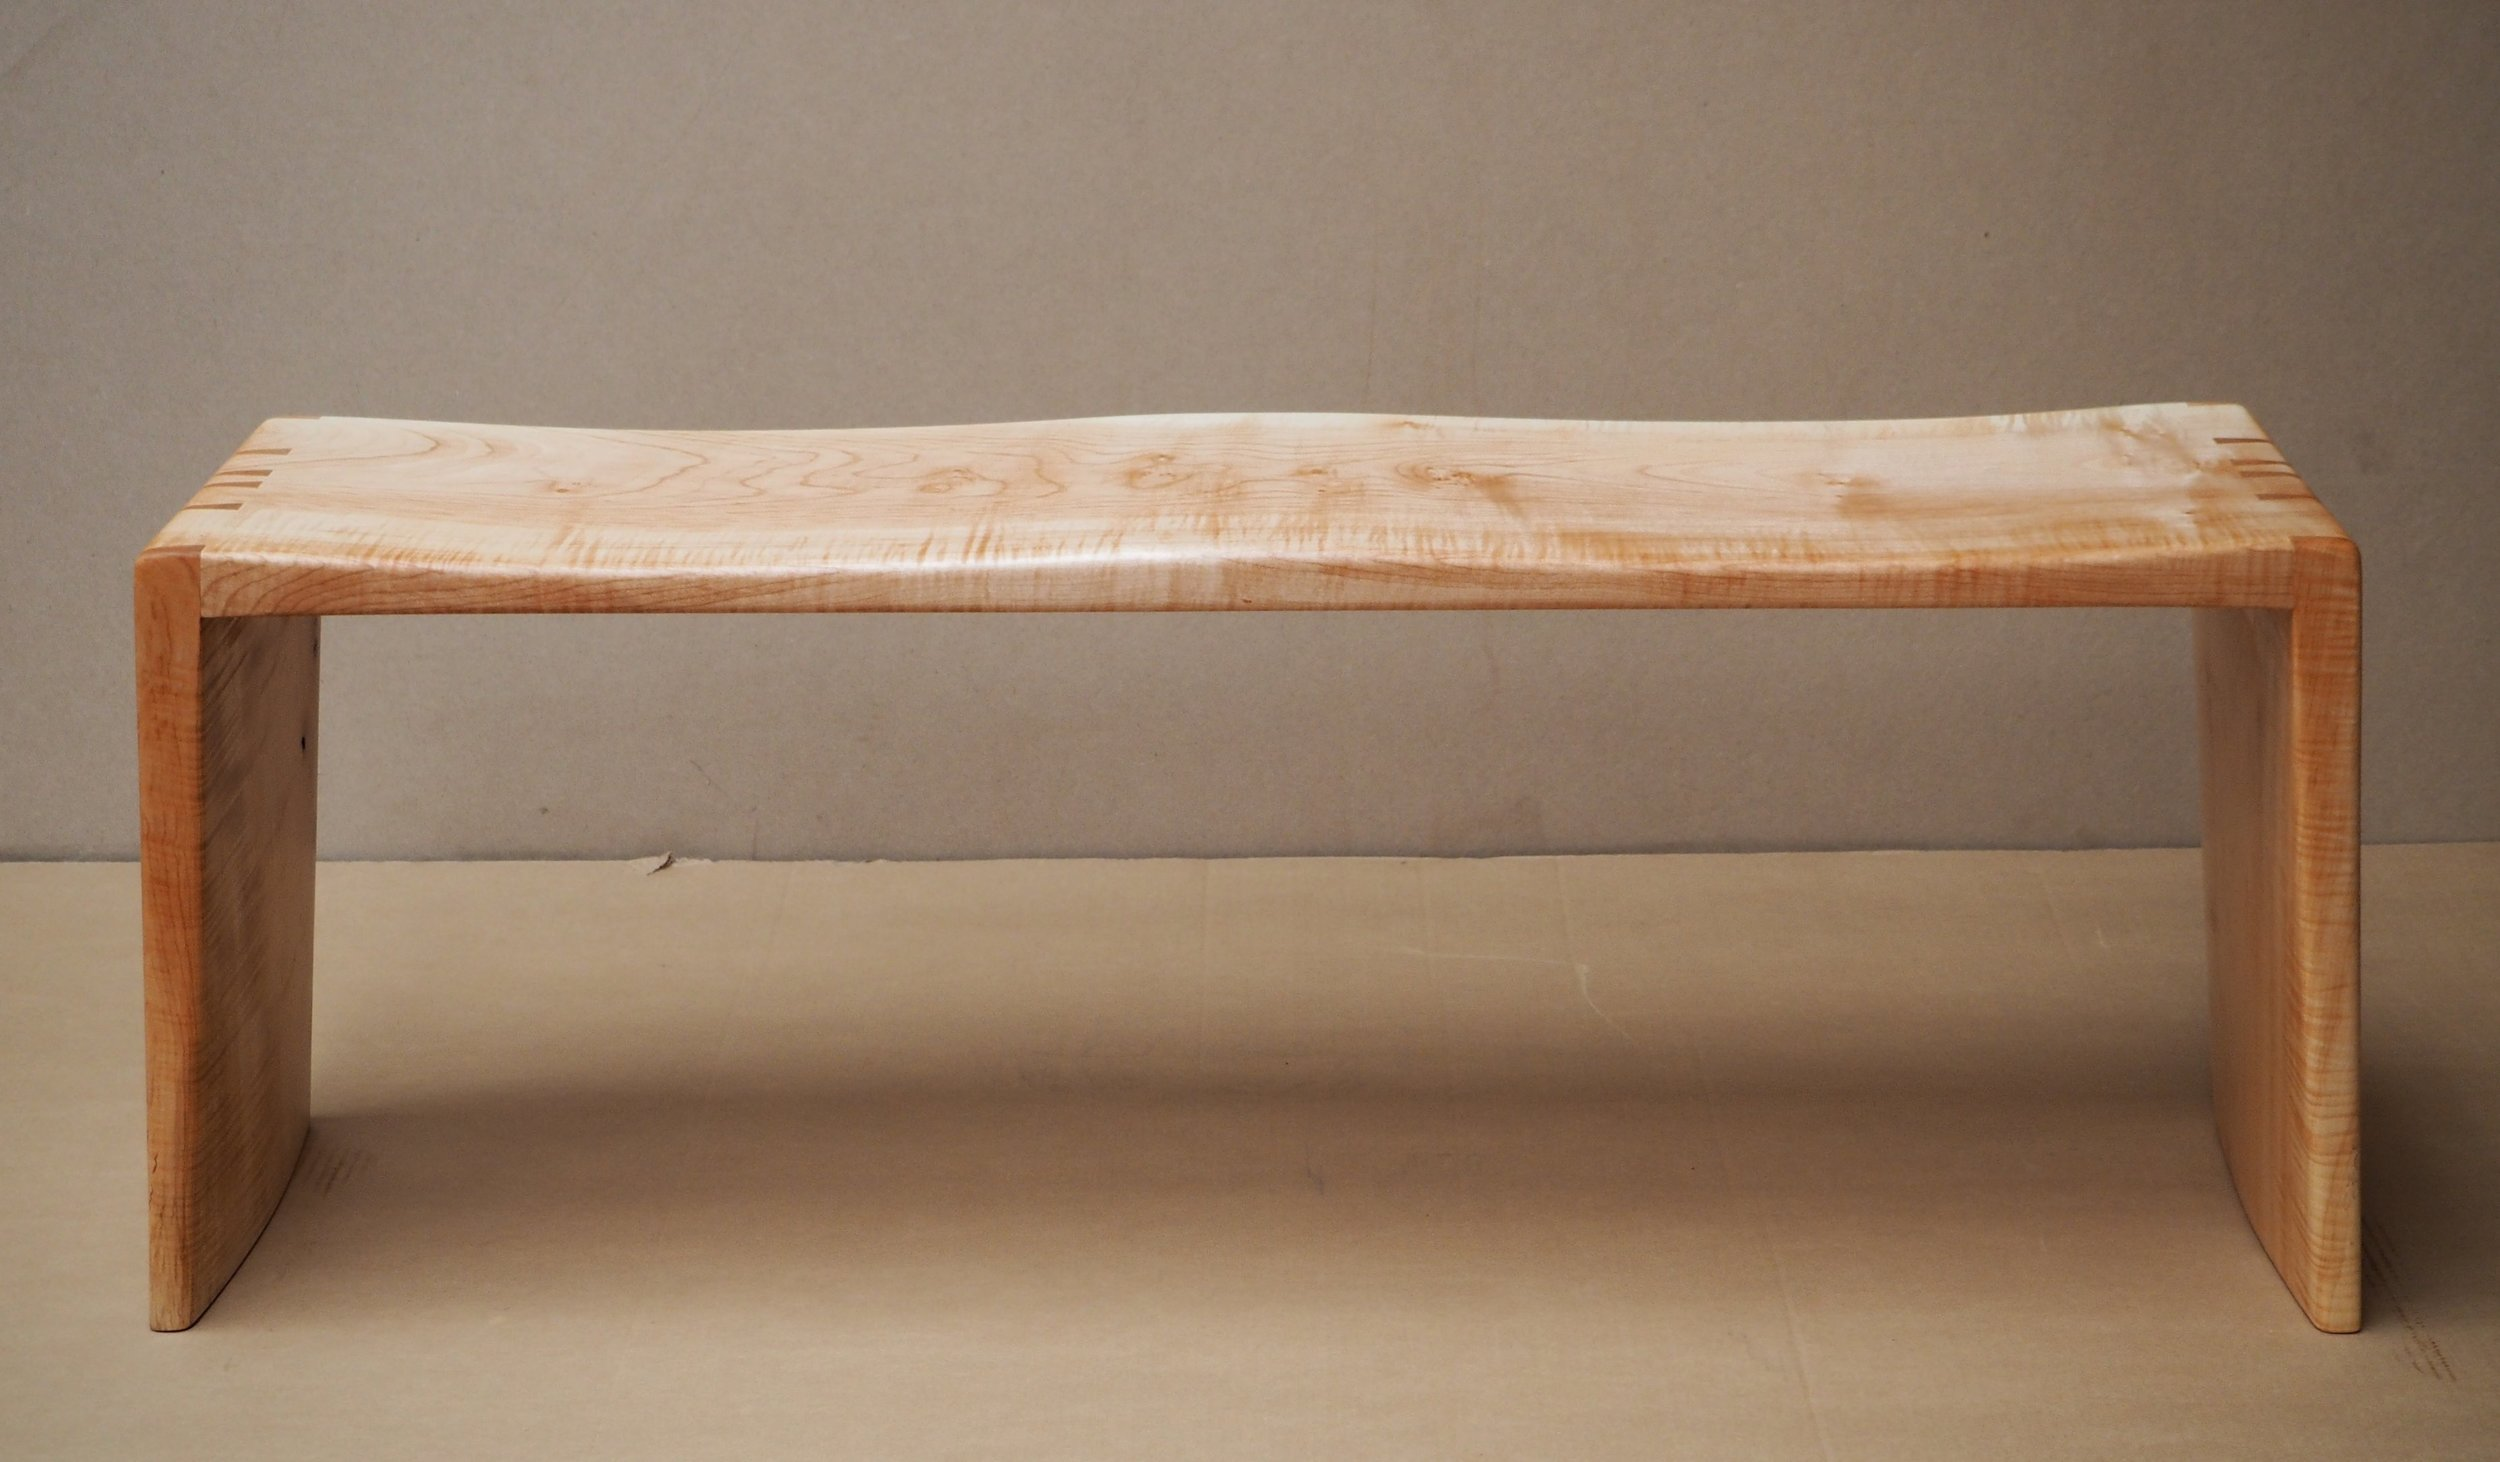 Maple Bench Seat1 copy.jpg